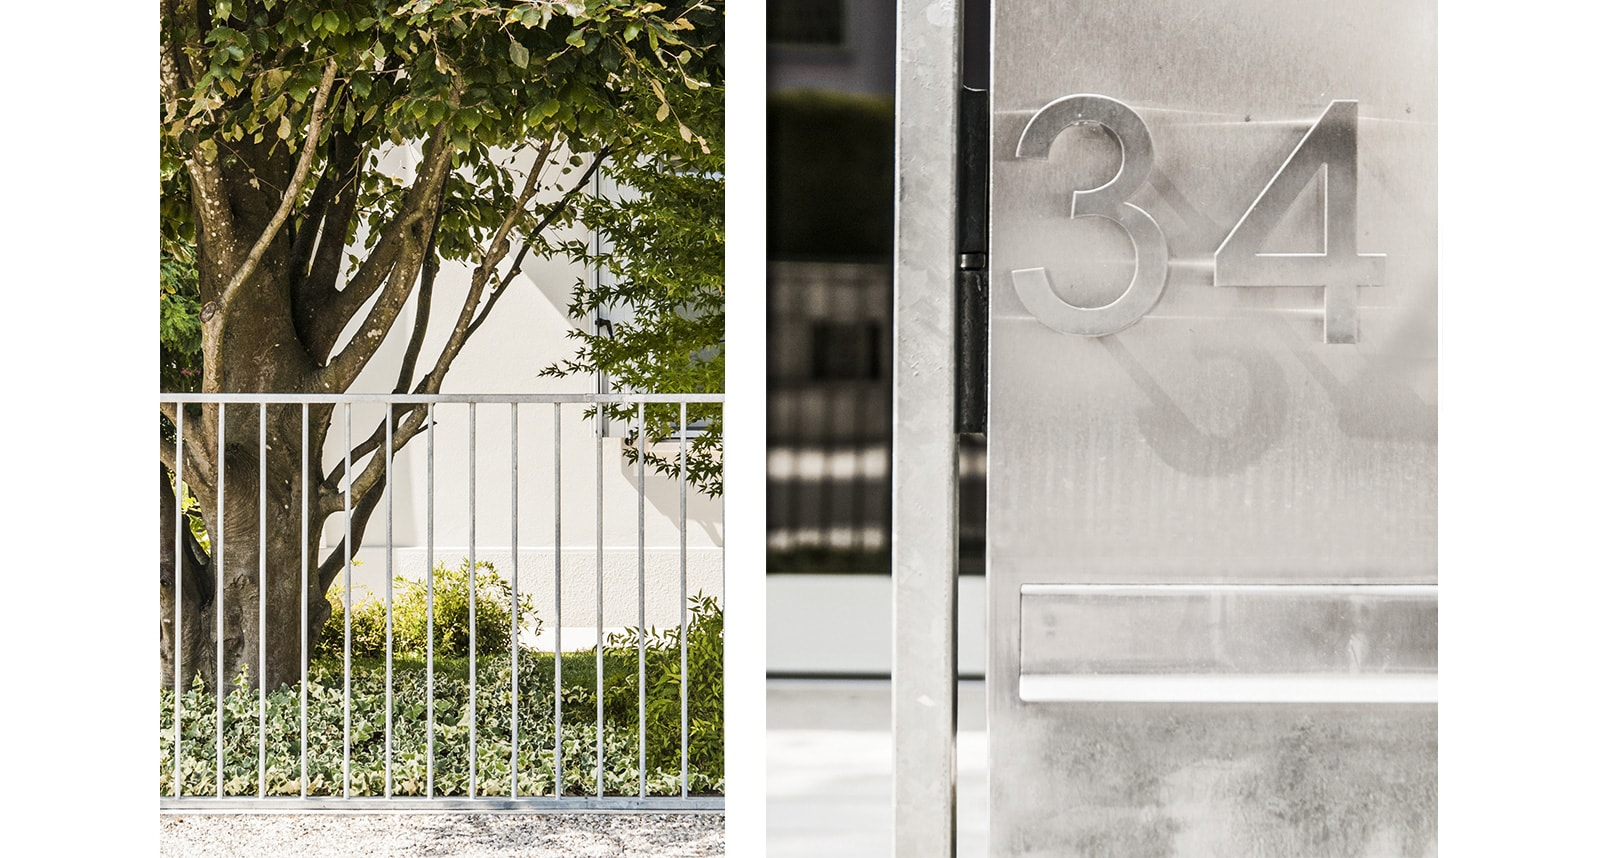 casa-giardino-via-berzuini-34-details-2